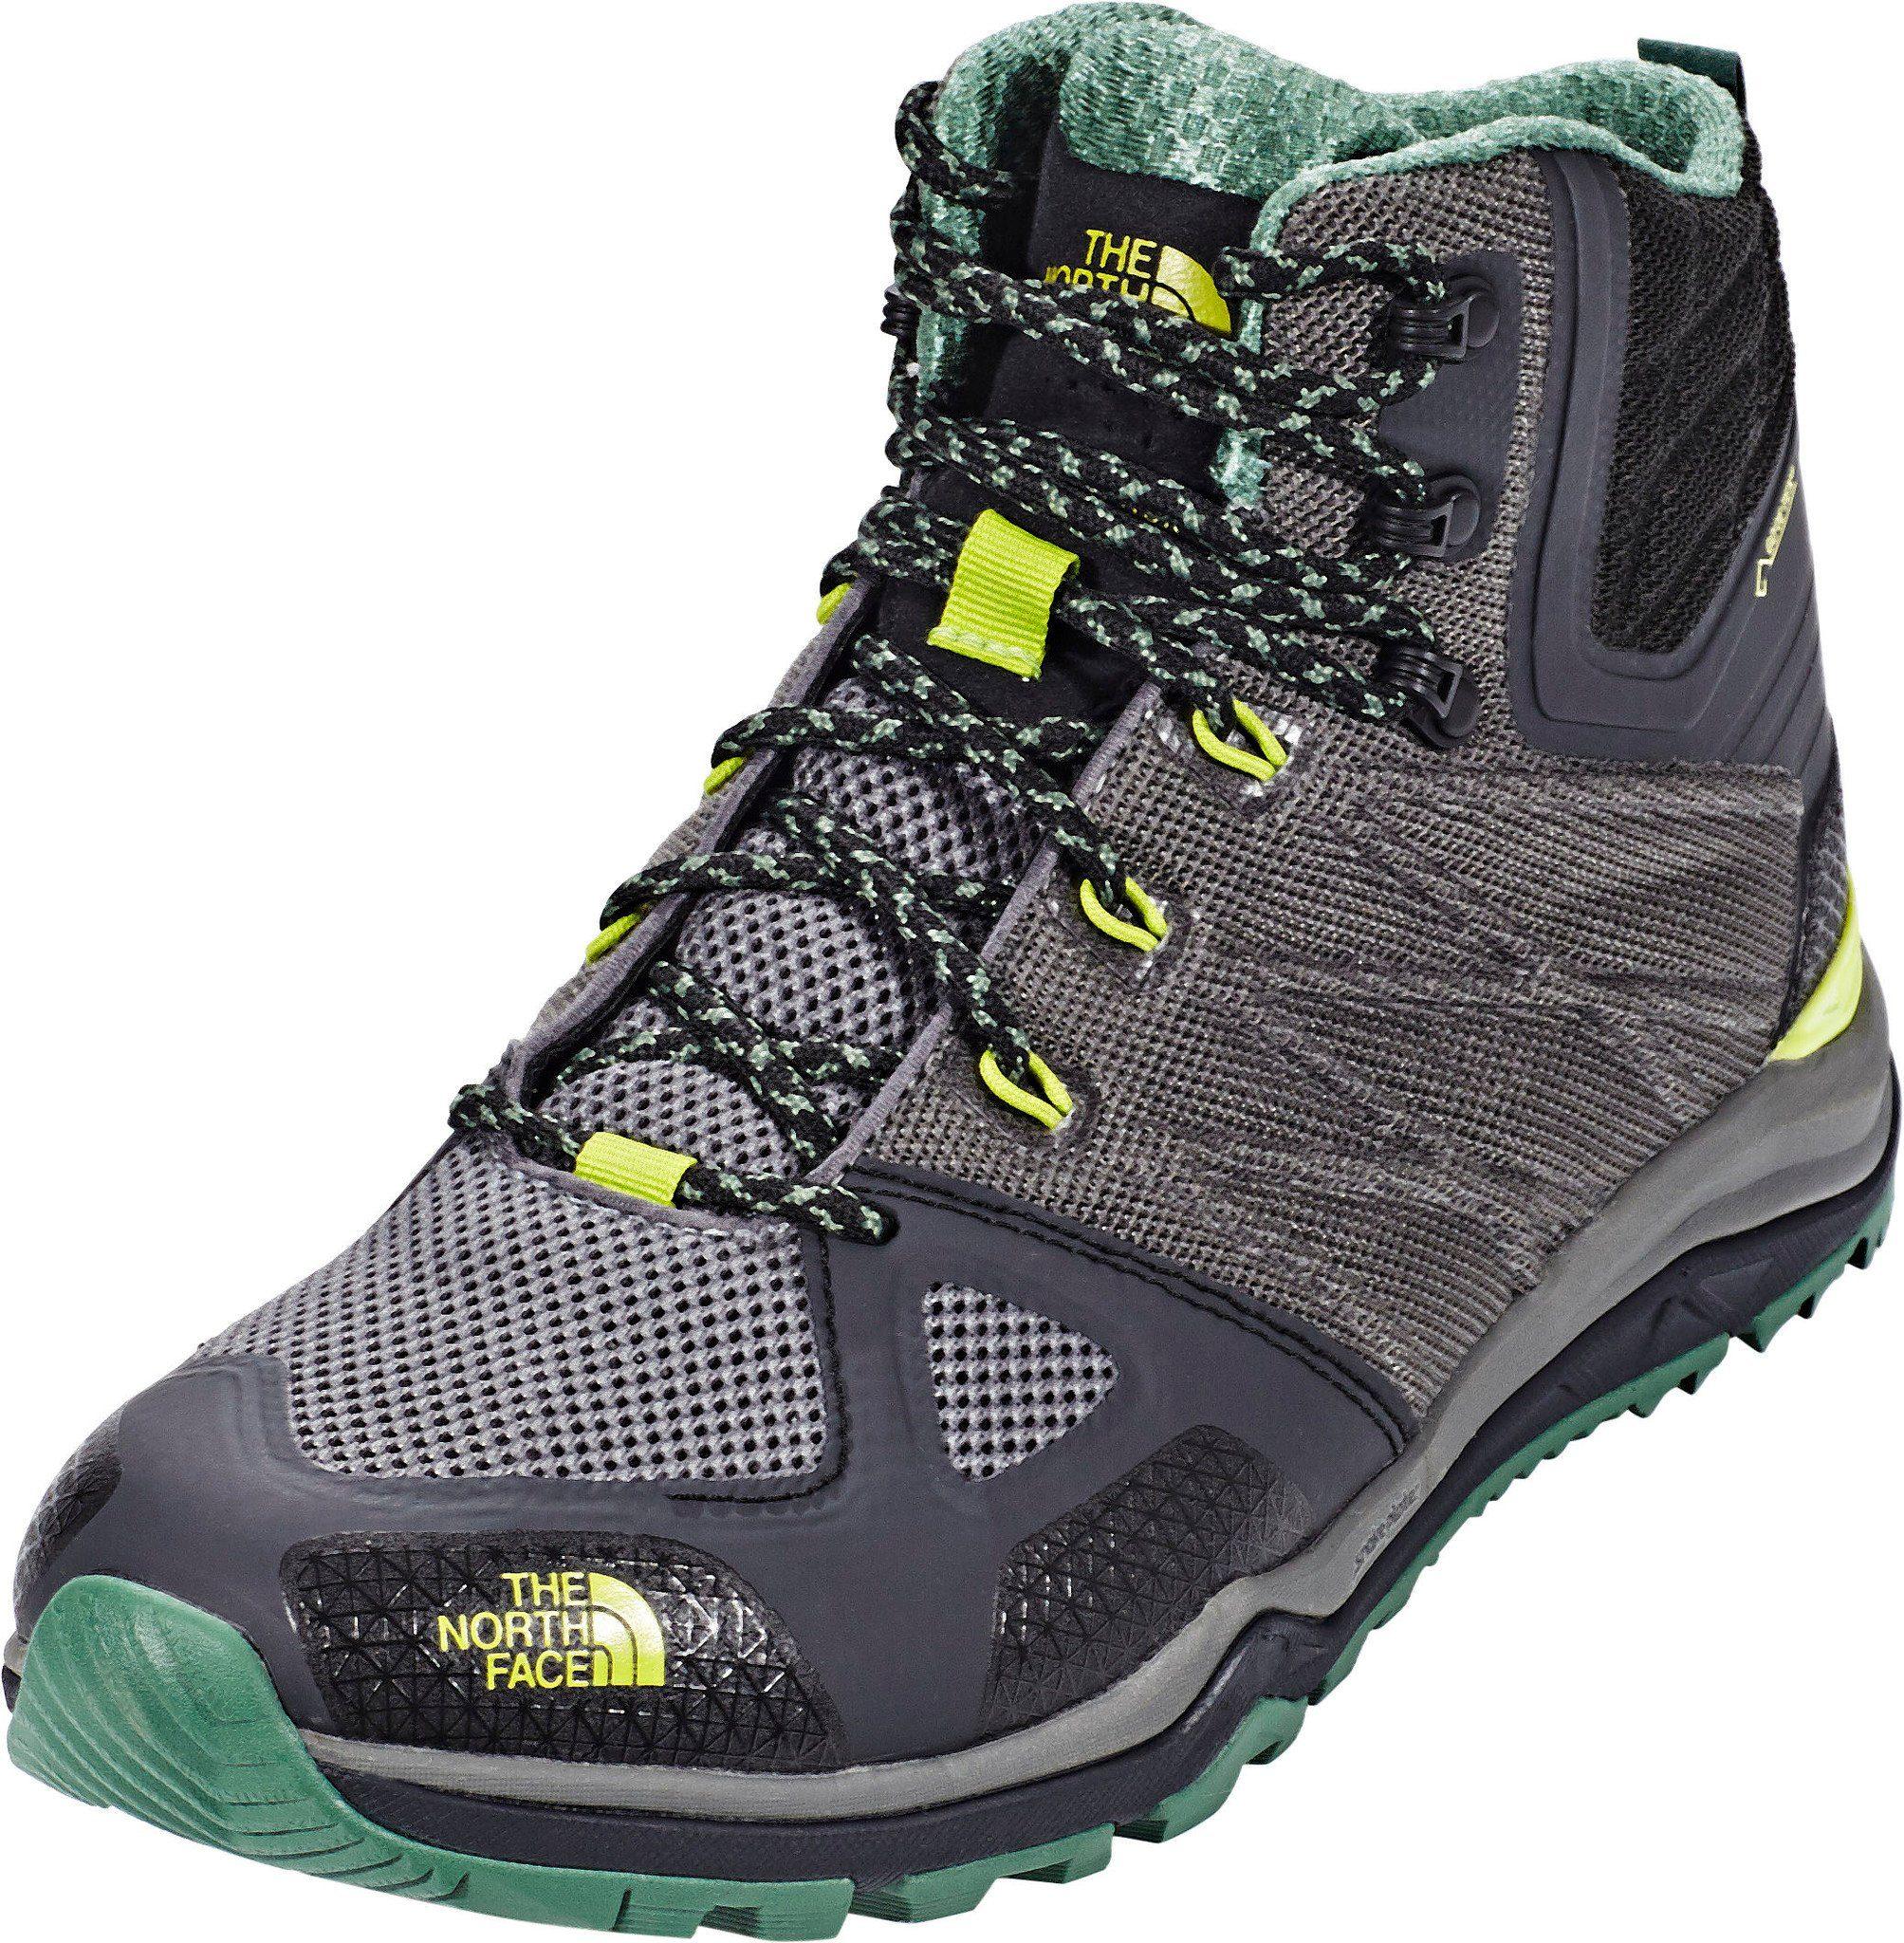 The North Face Kletterschuh Ultra Fastpack II Mid GTX Shoes Men online kaufen  grau